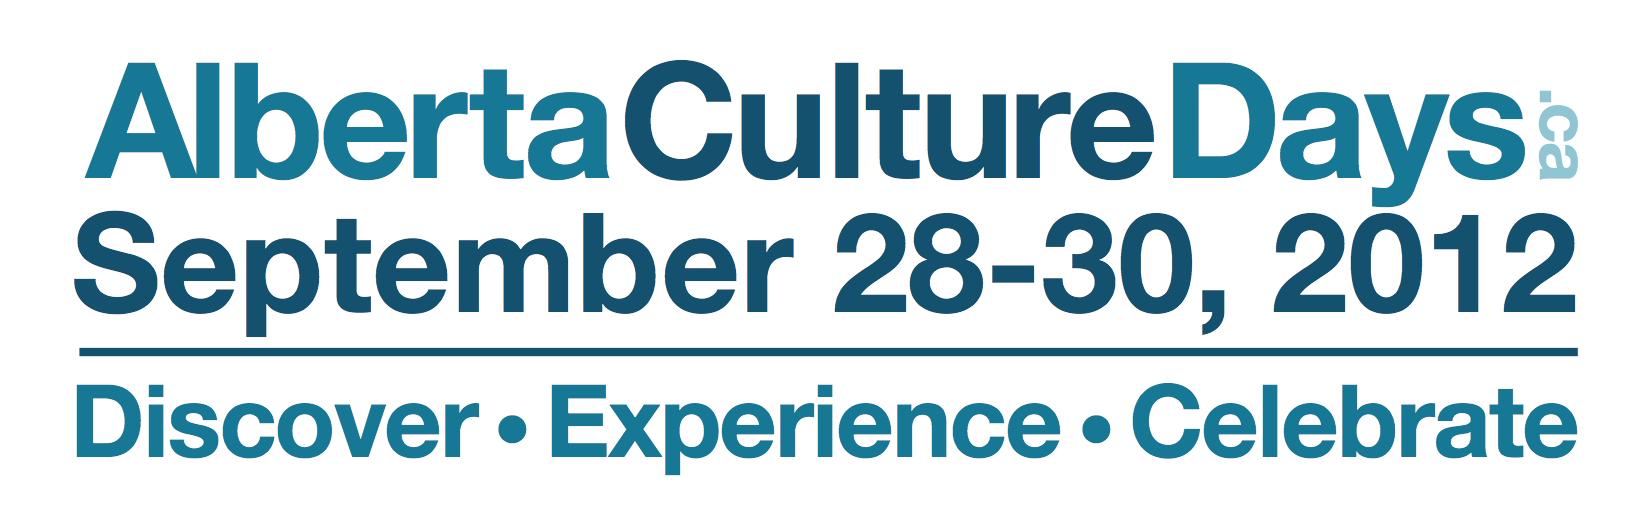 Alberta Culture Days ---  September 28 – 30, 2012